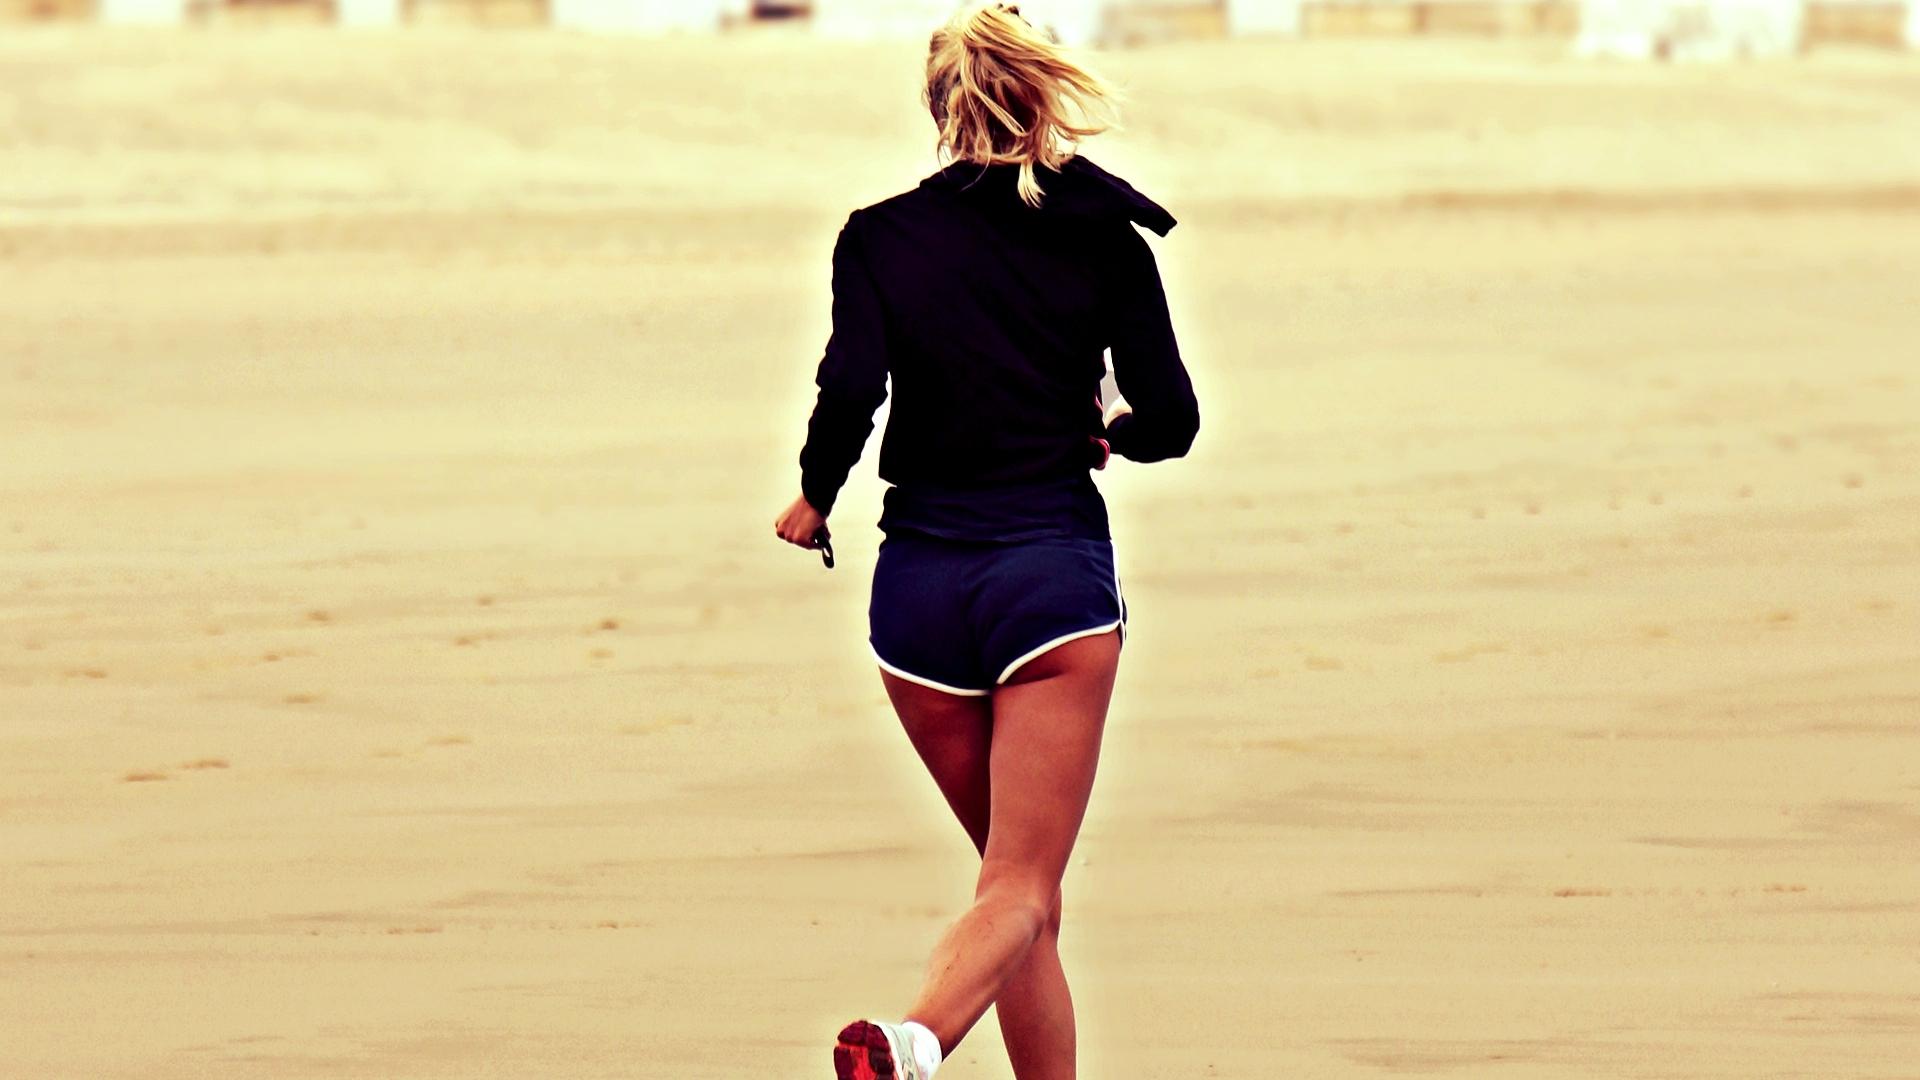 Female-jog.jpg